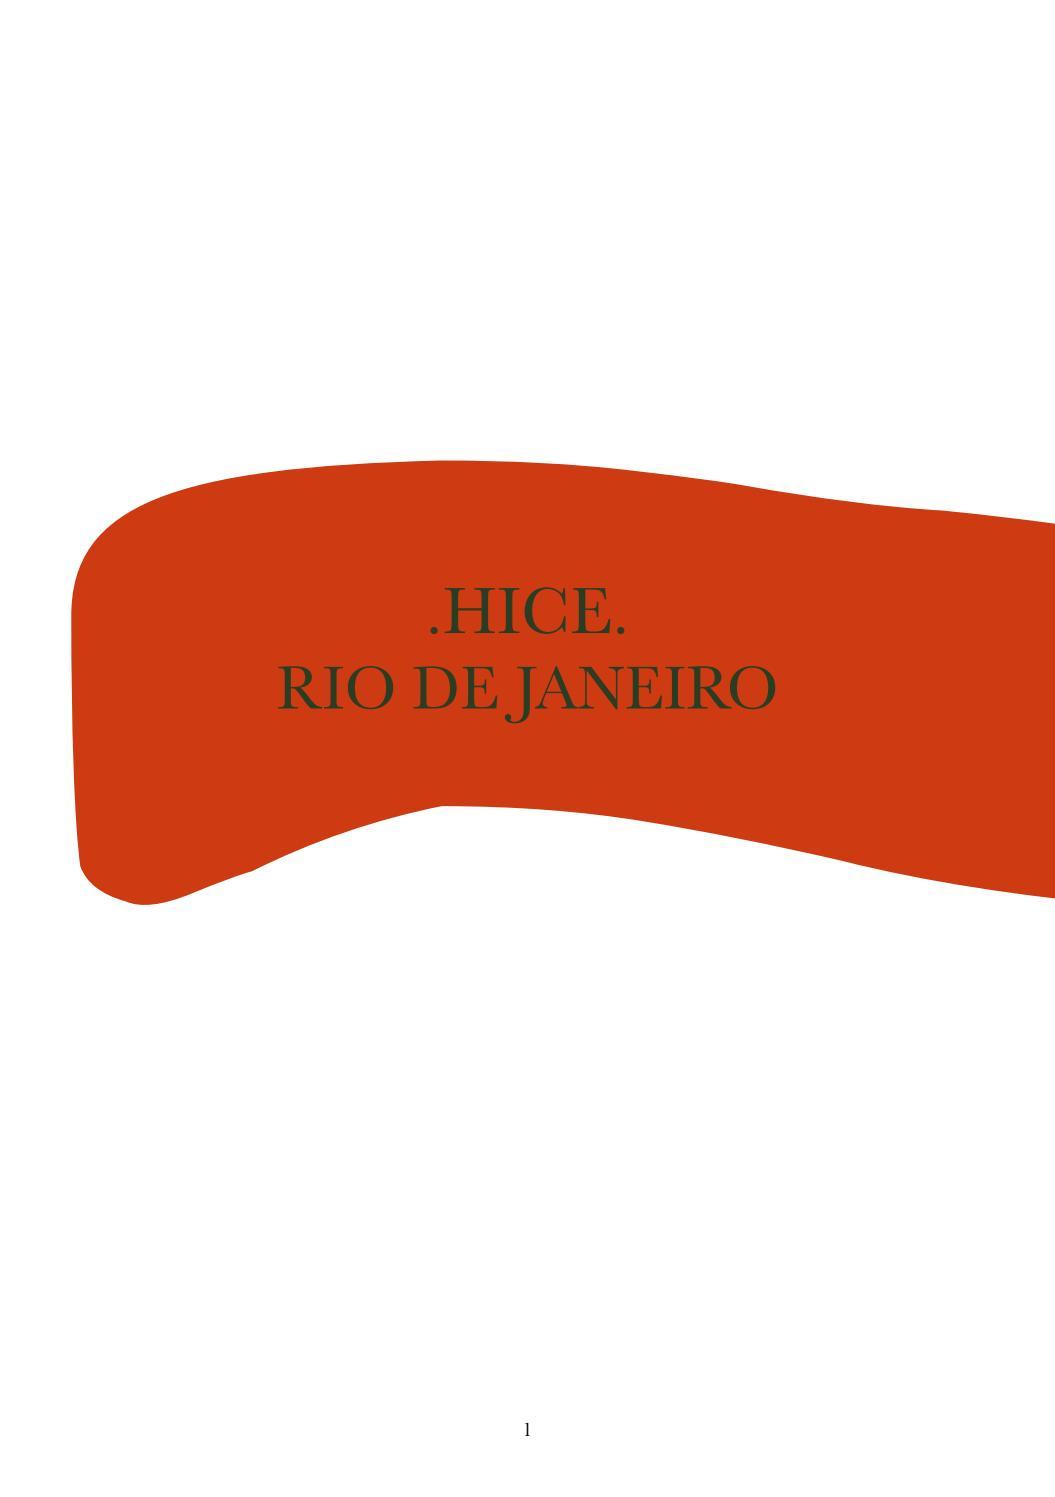 Pasajes Capitulo Rio De Janeiro By Ari Jinchuk Issuu